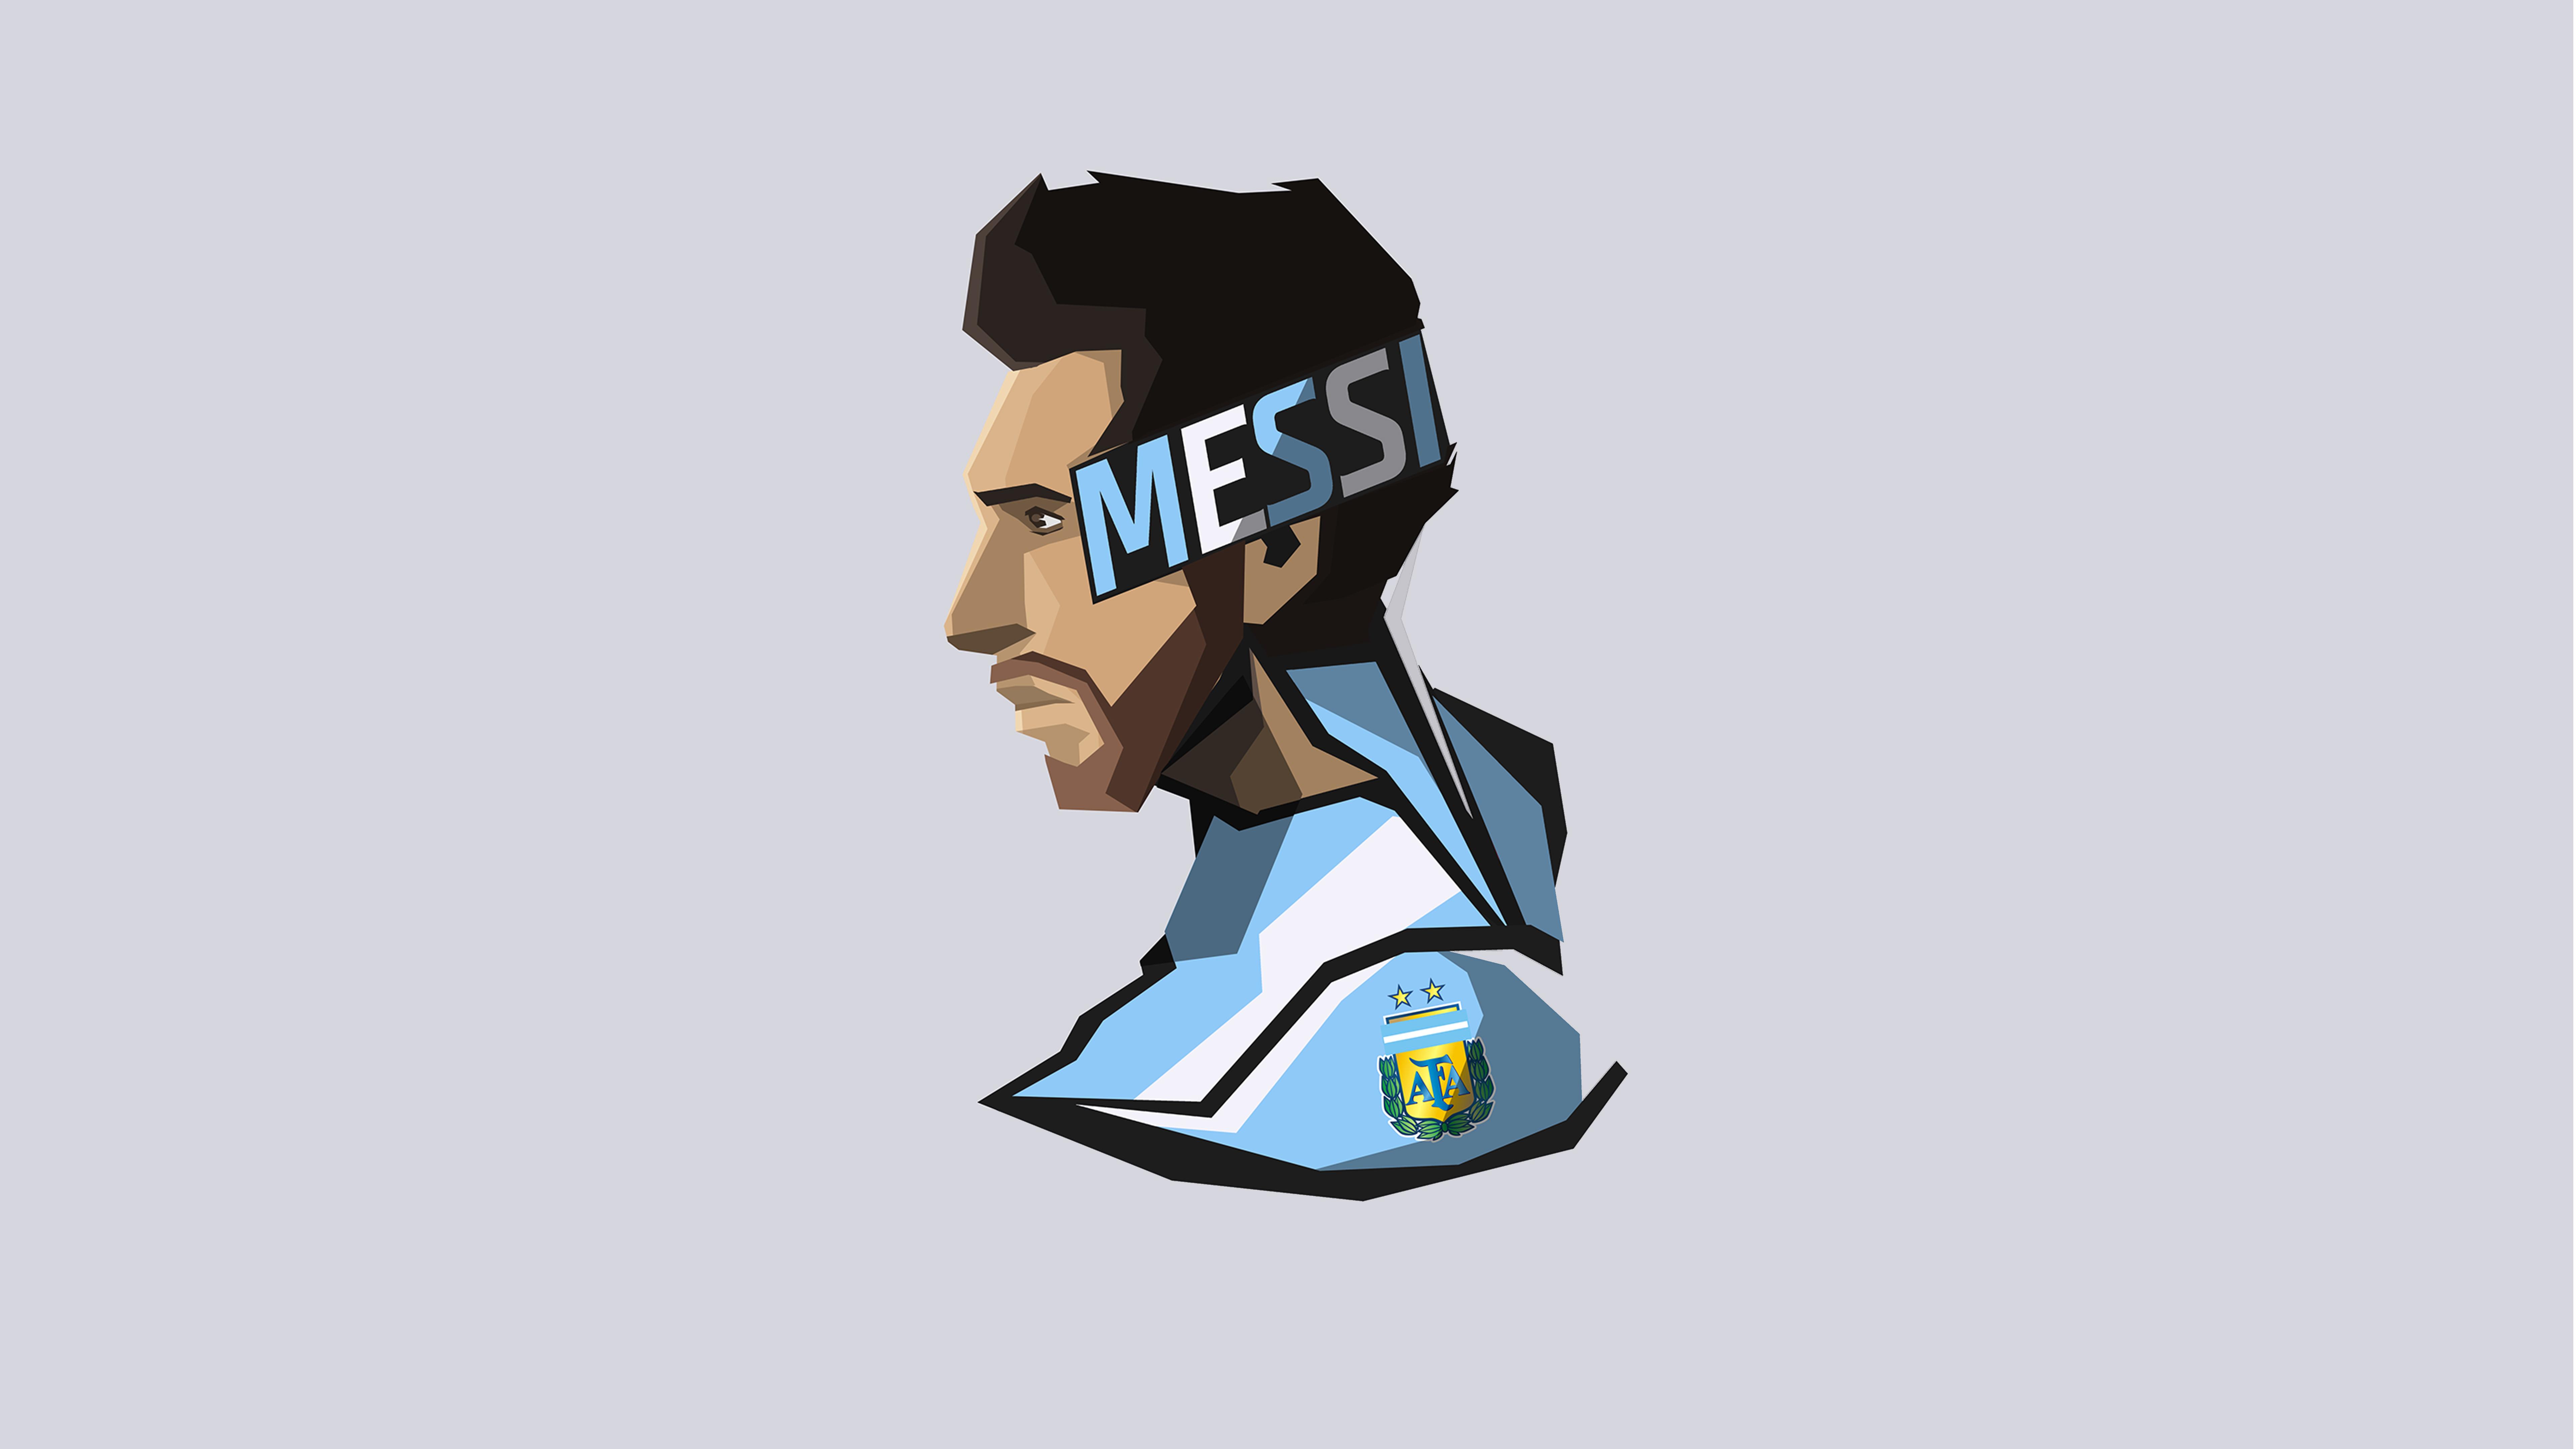 lionel messi minimal 4k 1604346988 - Lionel Messi Minimal 4k - Lionel Messi Minimal 4k wallpapers